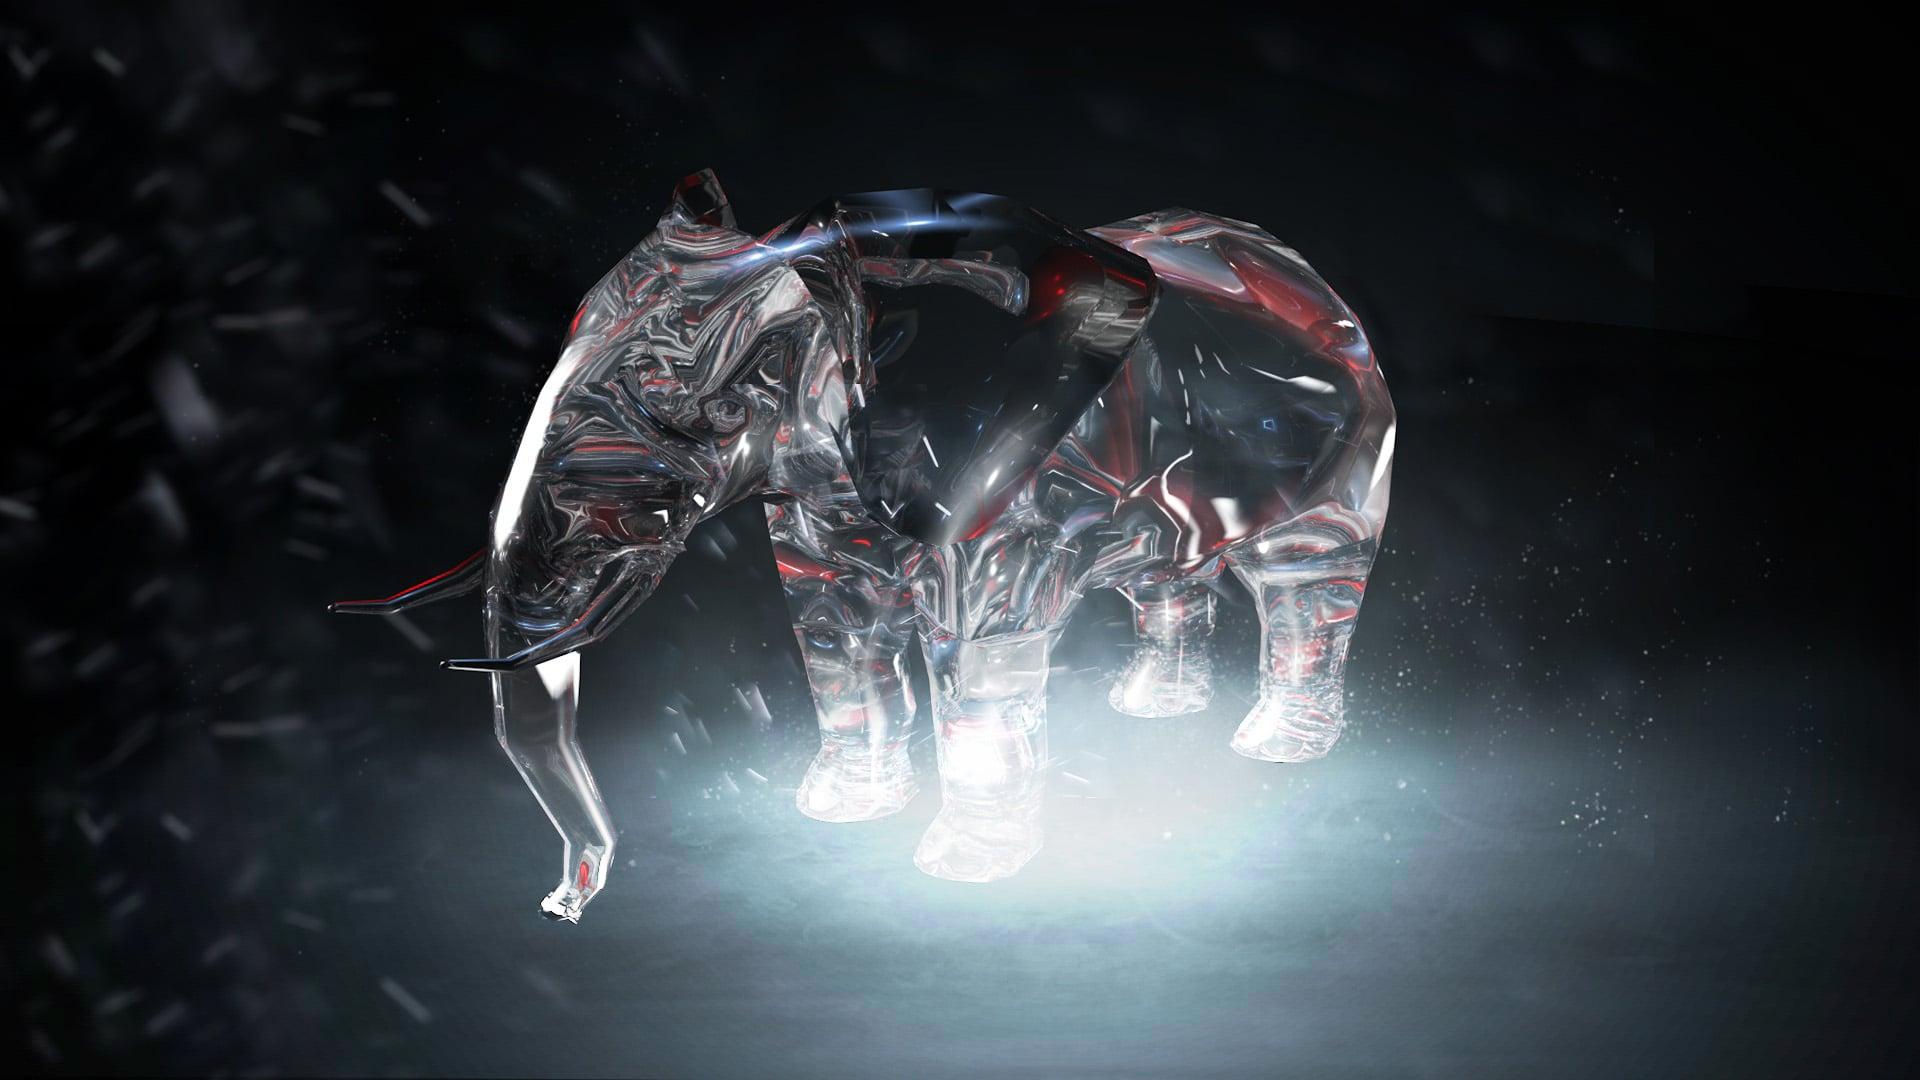 Elephant Ice Sculpt Zoo Lights Concept 2